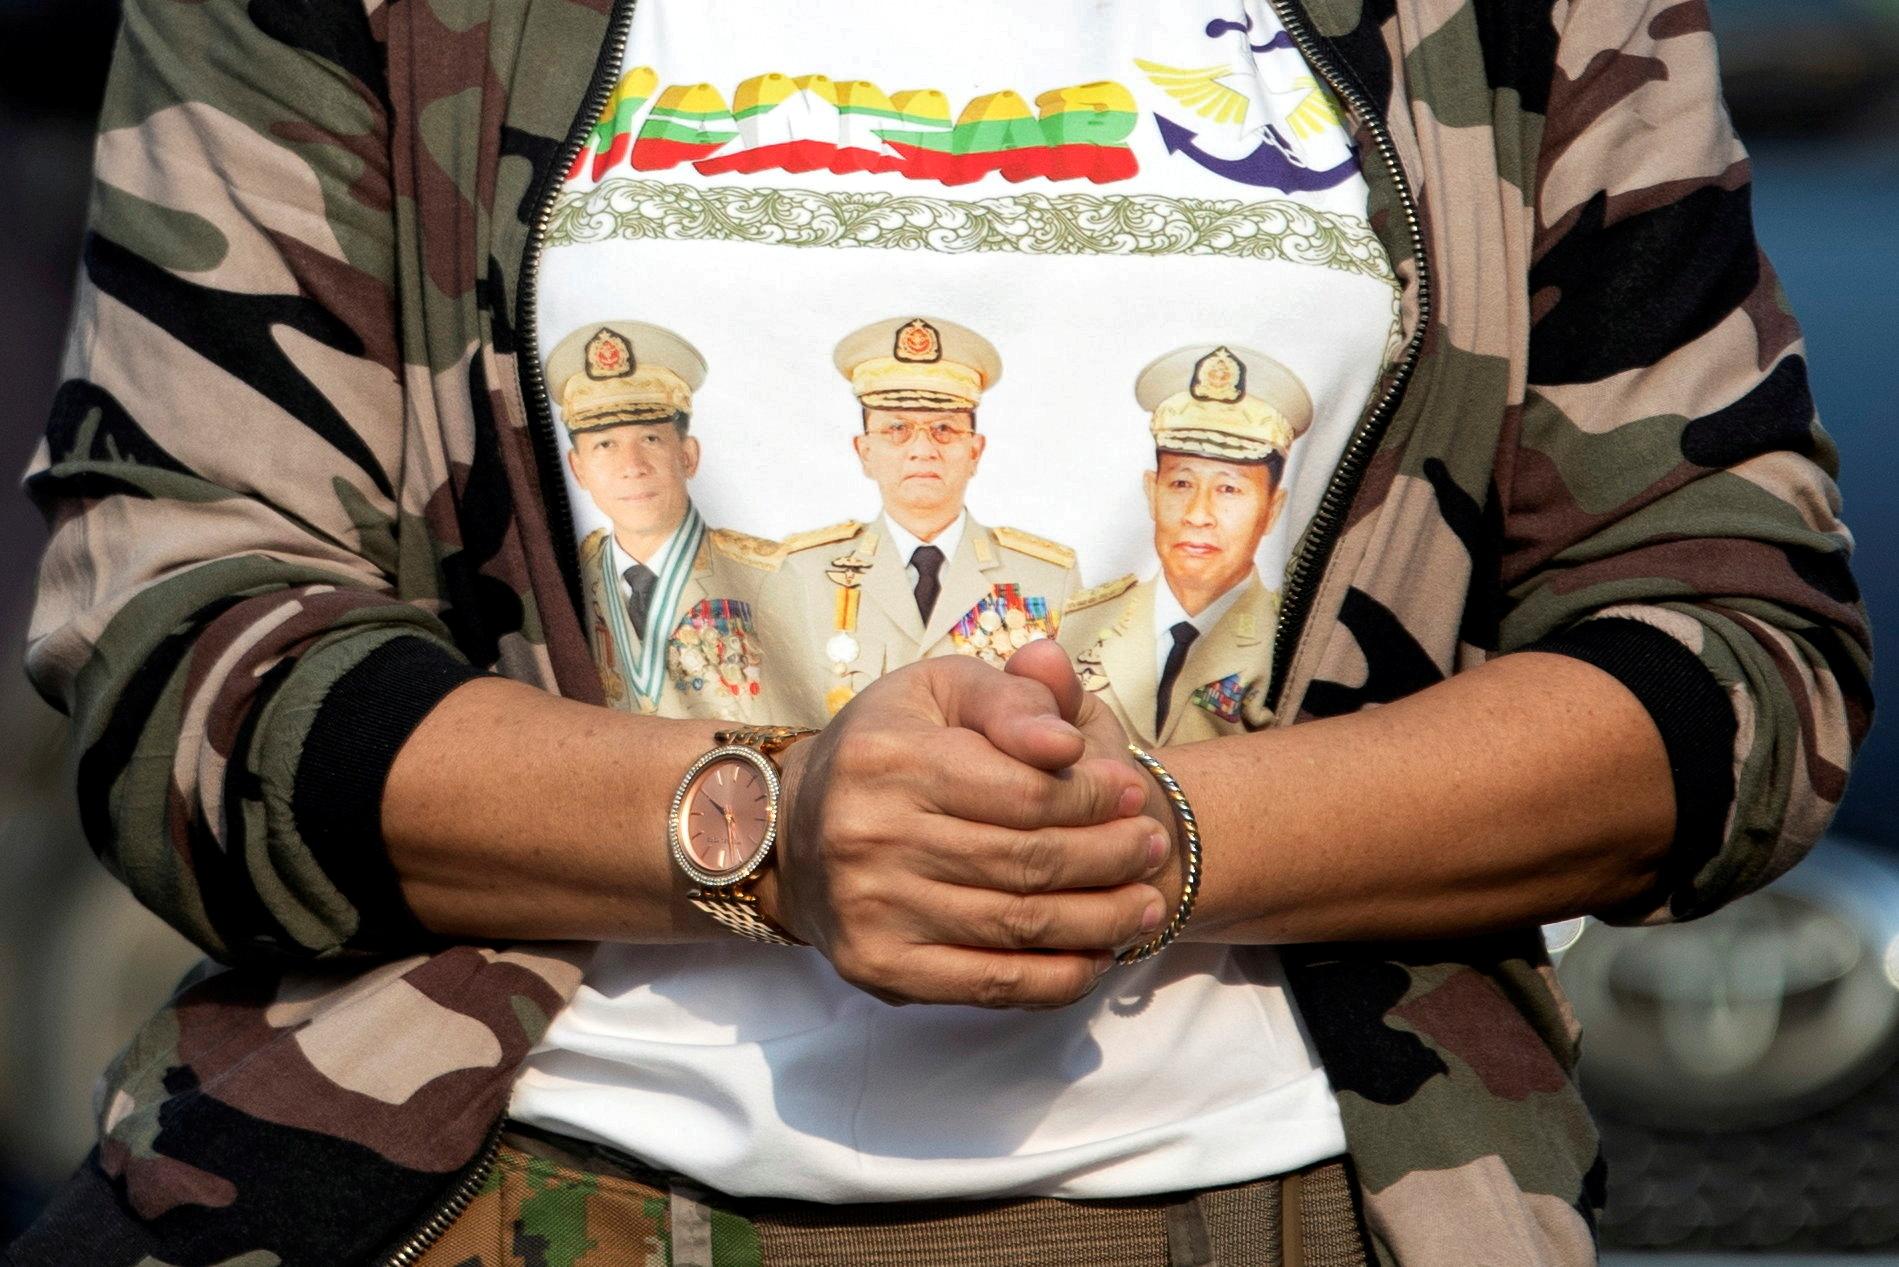 Myanmar's military junta plans probe of November election